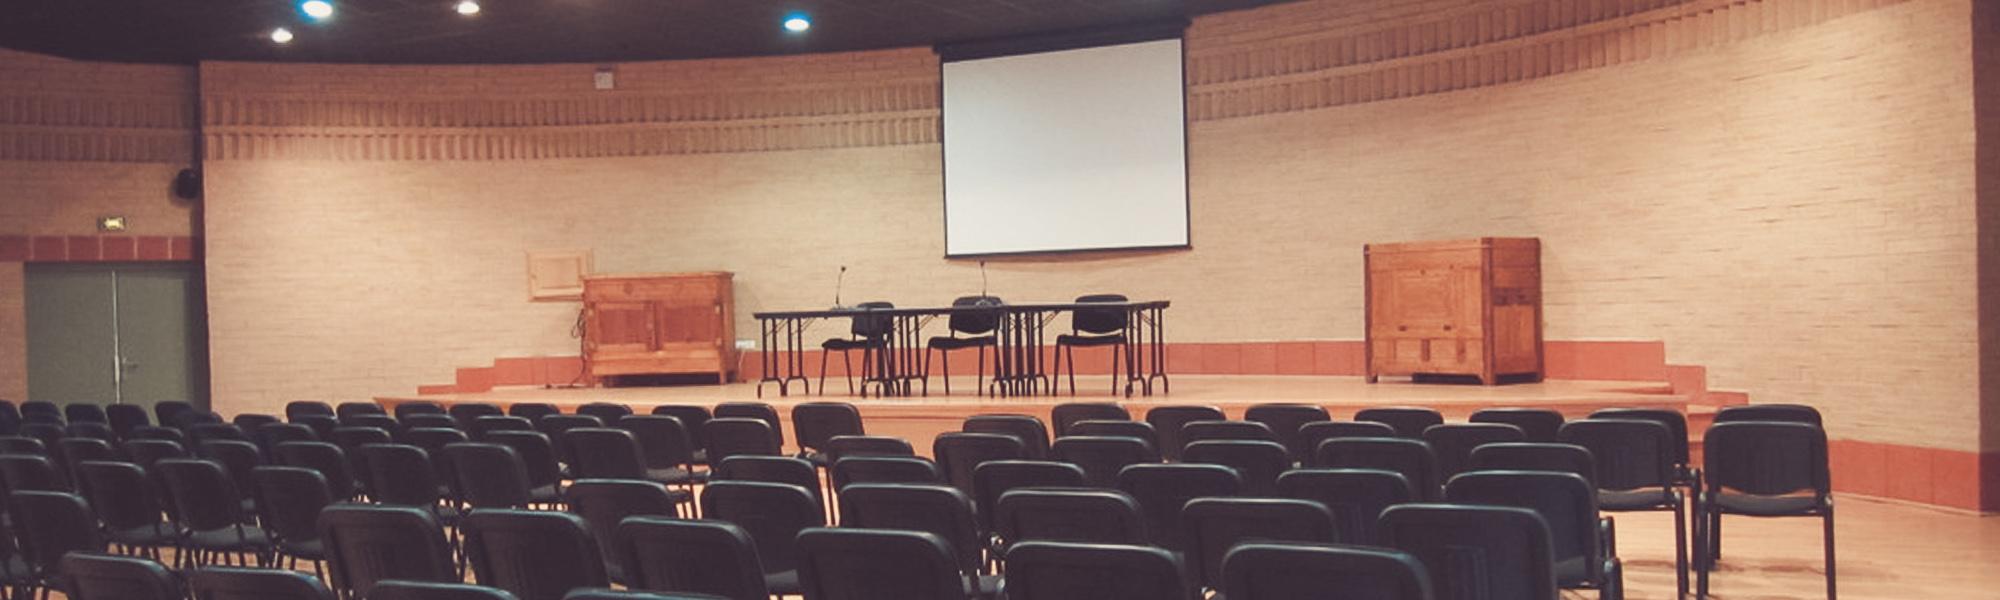 reserver salle de conférence